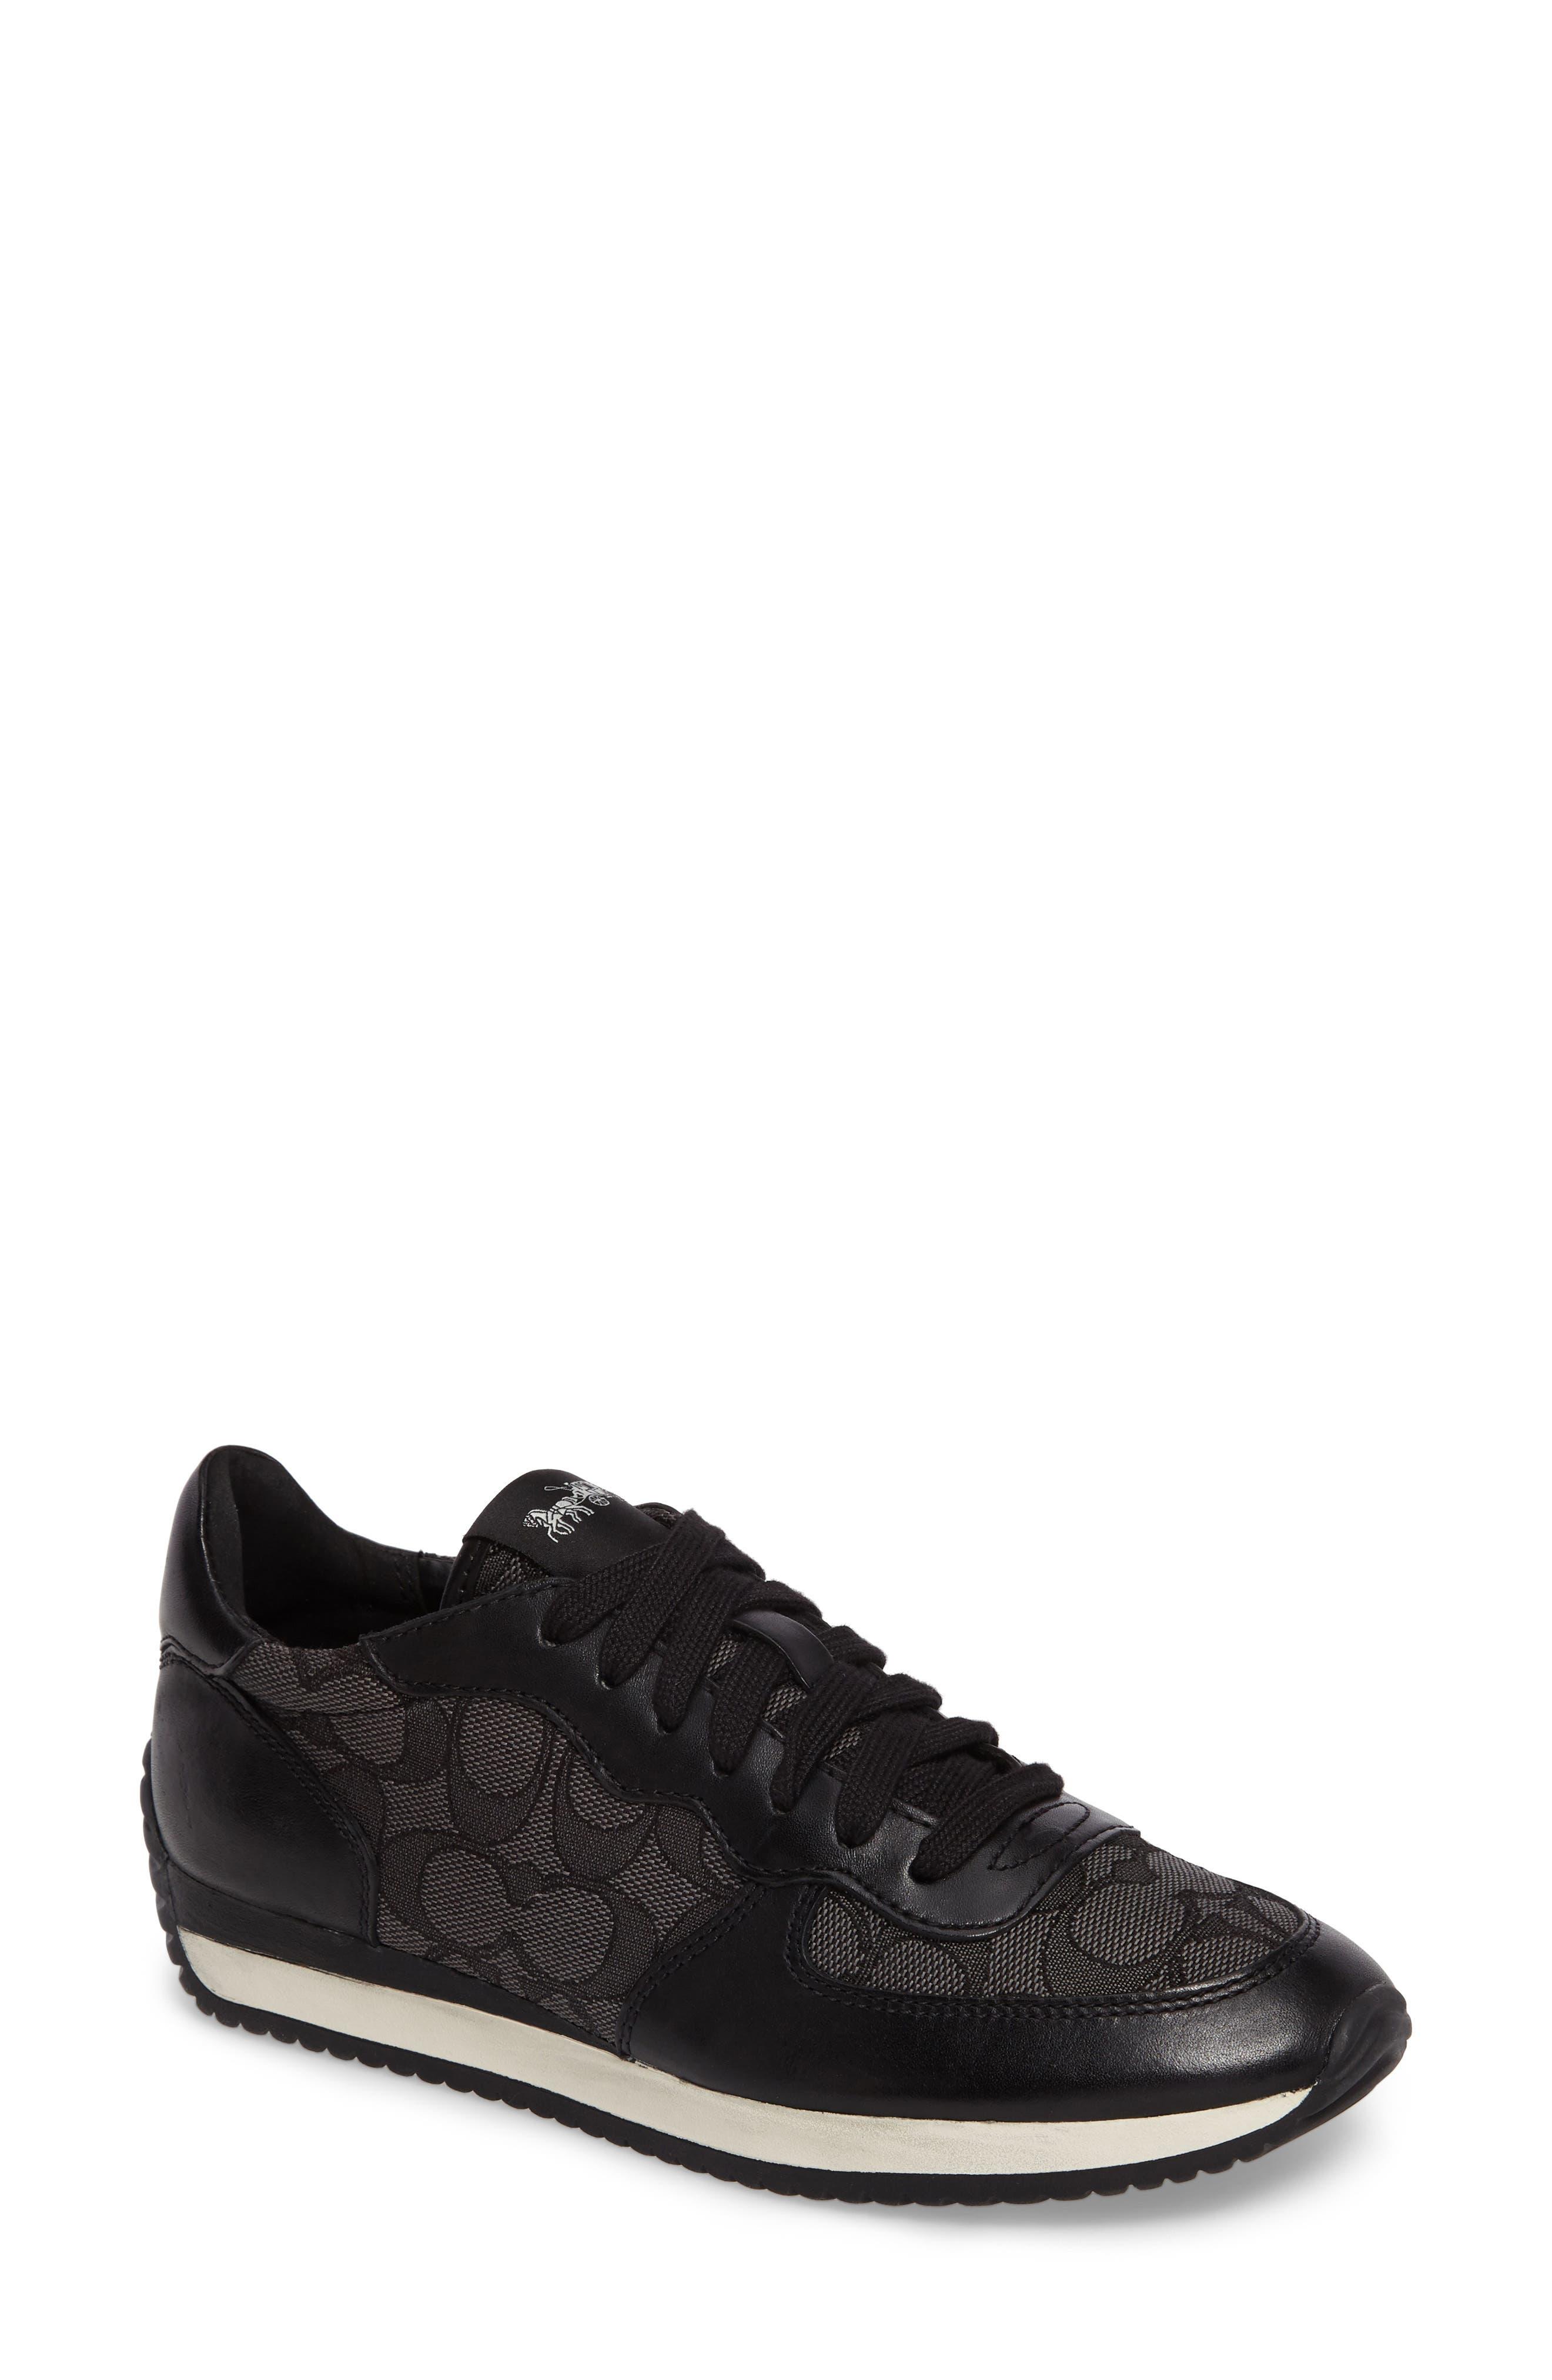 COACH Farah Sneaker, Main, color, 011